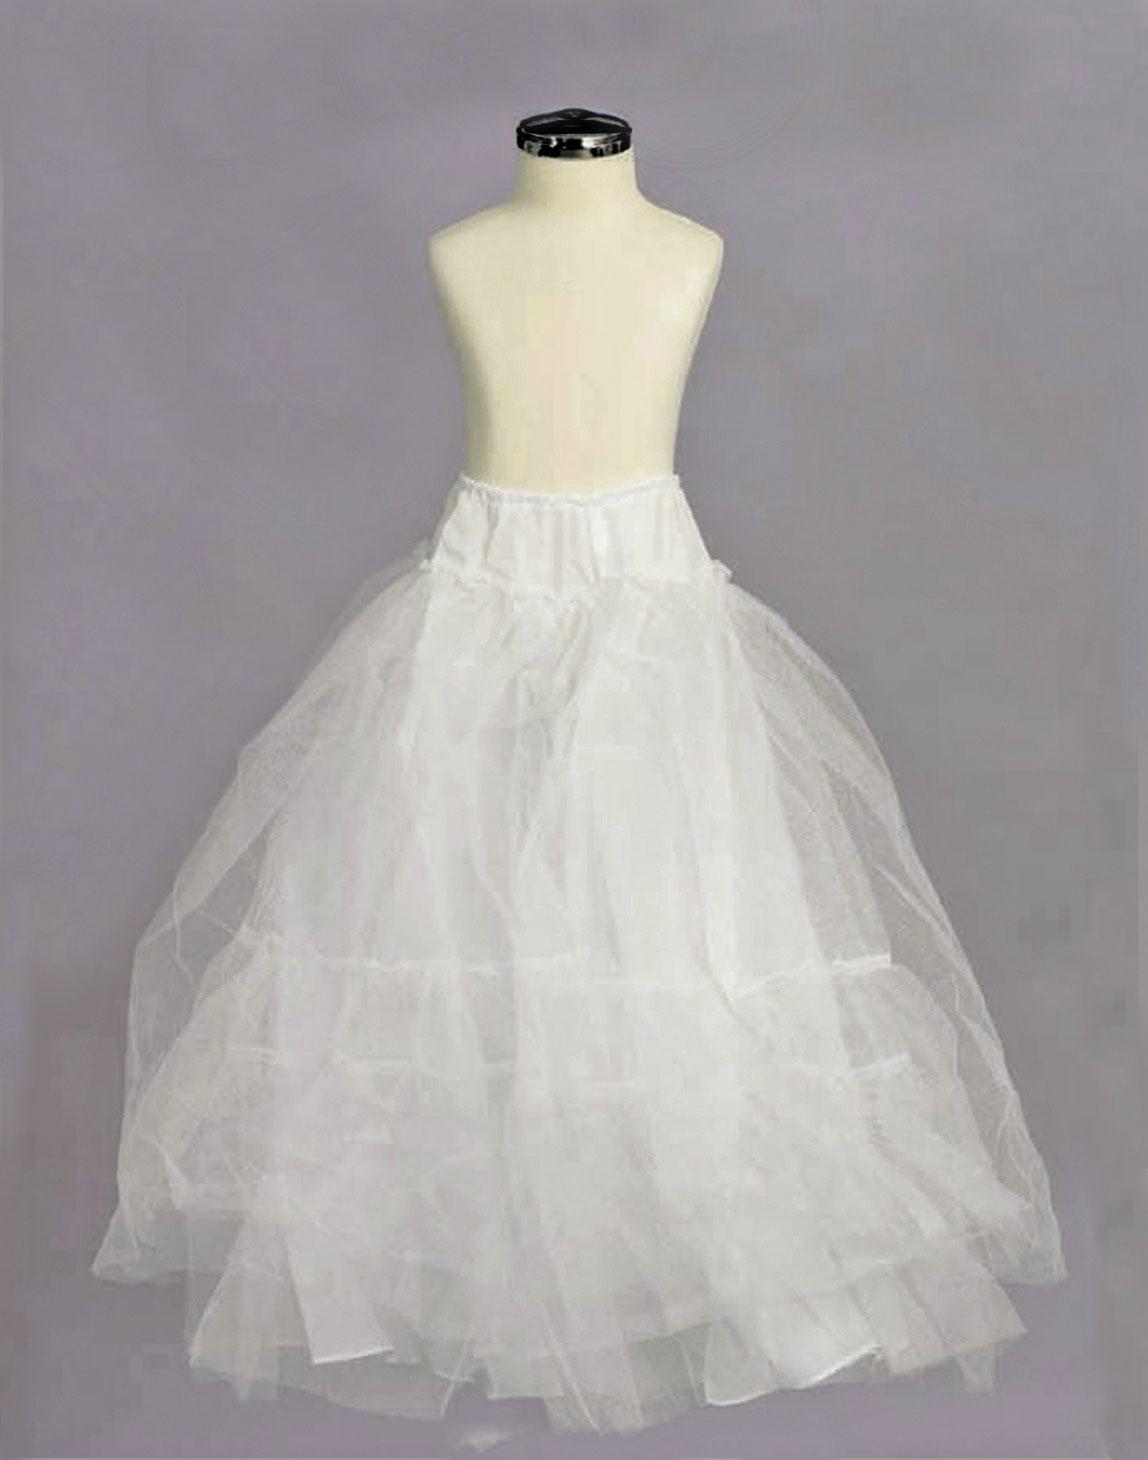 AG PC911 Girls Tulle Petticoat Style PC911 Petticoats Flower Girl Dress